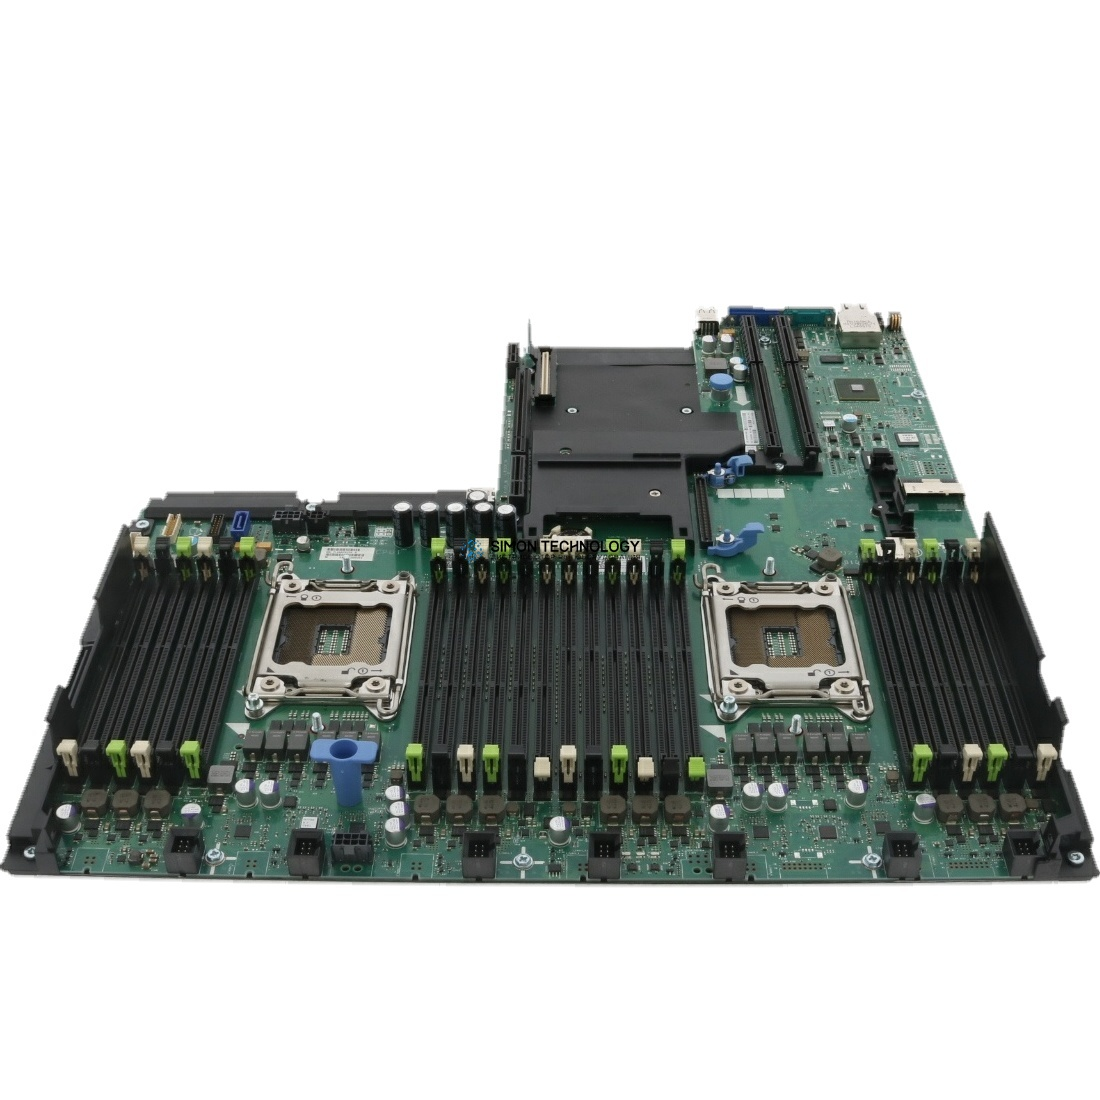 Материнская плата Dell PowerEdge R620 10 Bay VV3F2 Ask for custom qoute (PER620-SFF-10-VV3F2)